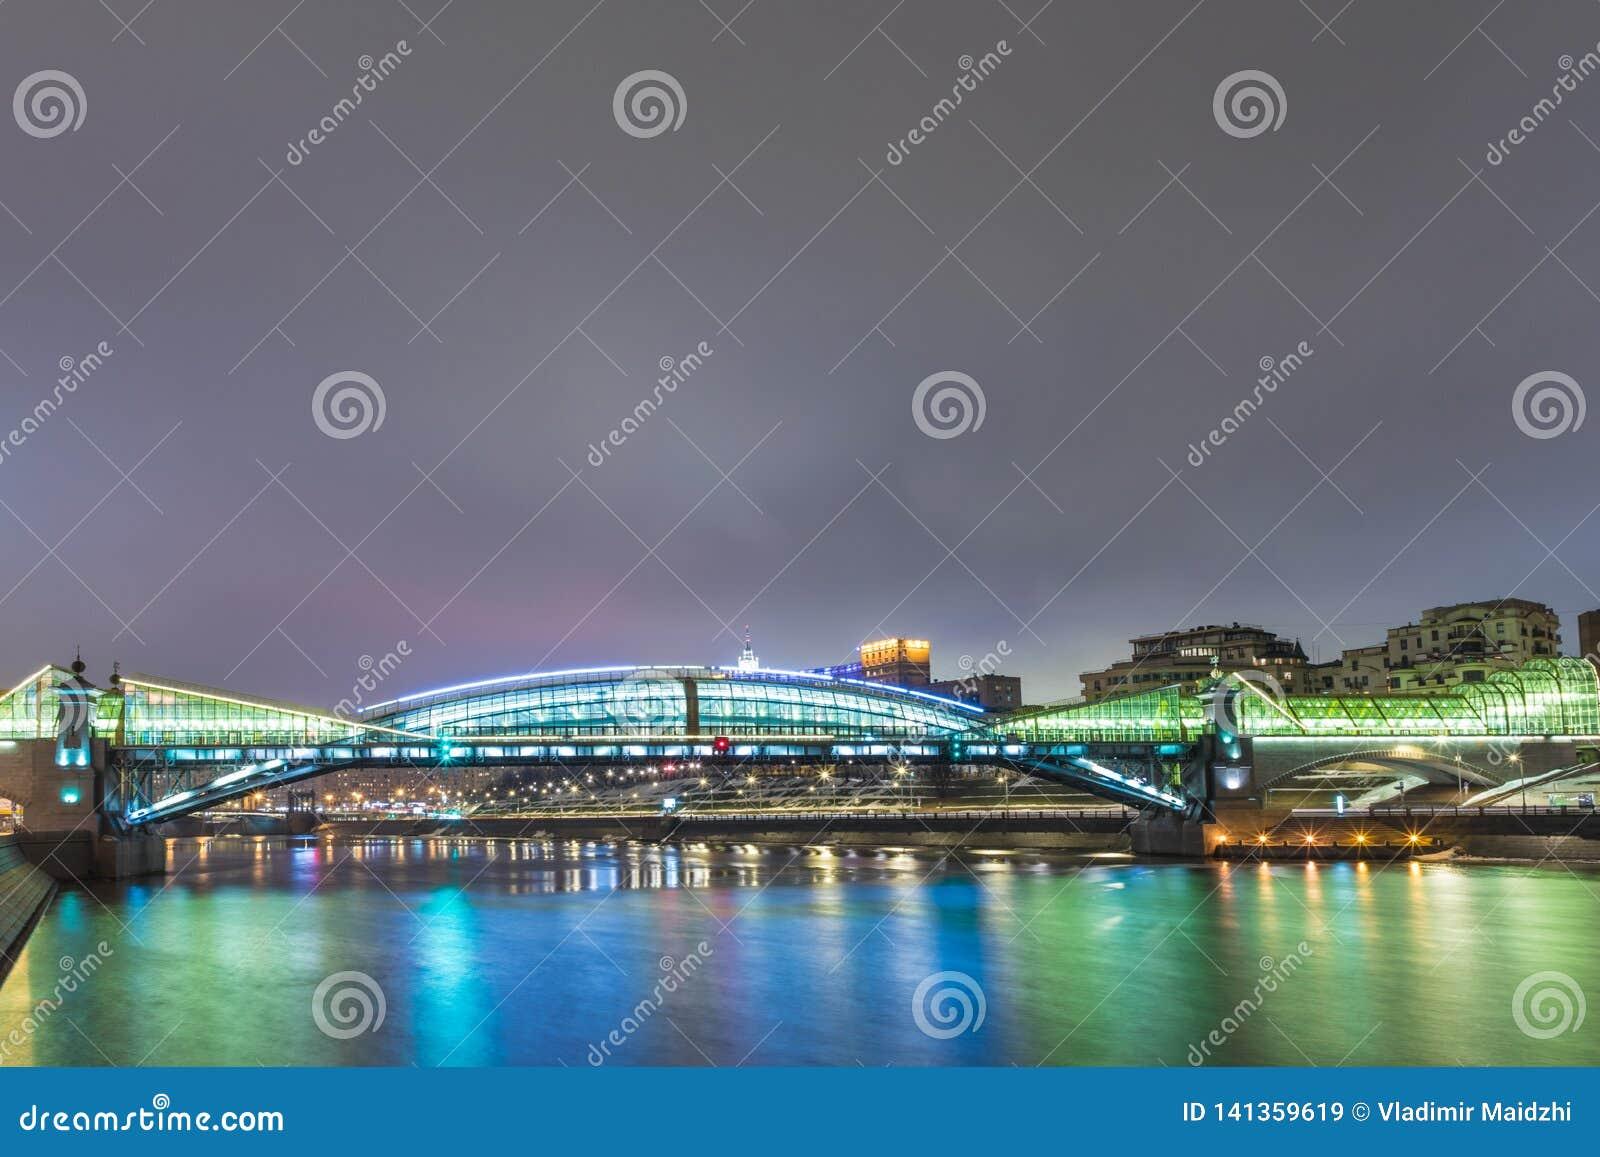 Moskou/Rusland - Maart 6, 2019: De Voetbrug van Bogdan Khmelnitsky of van Kievsky in Moskou in Maart het jaar van 2019